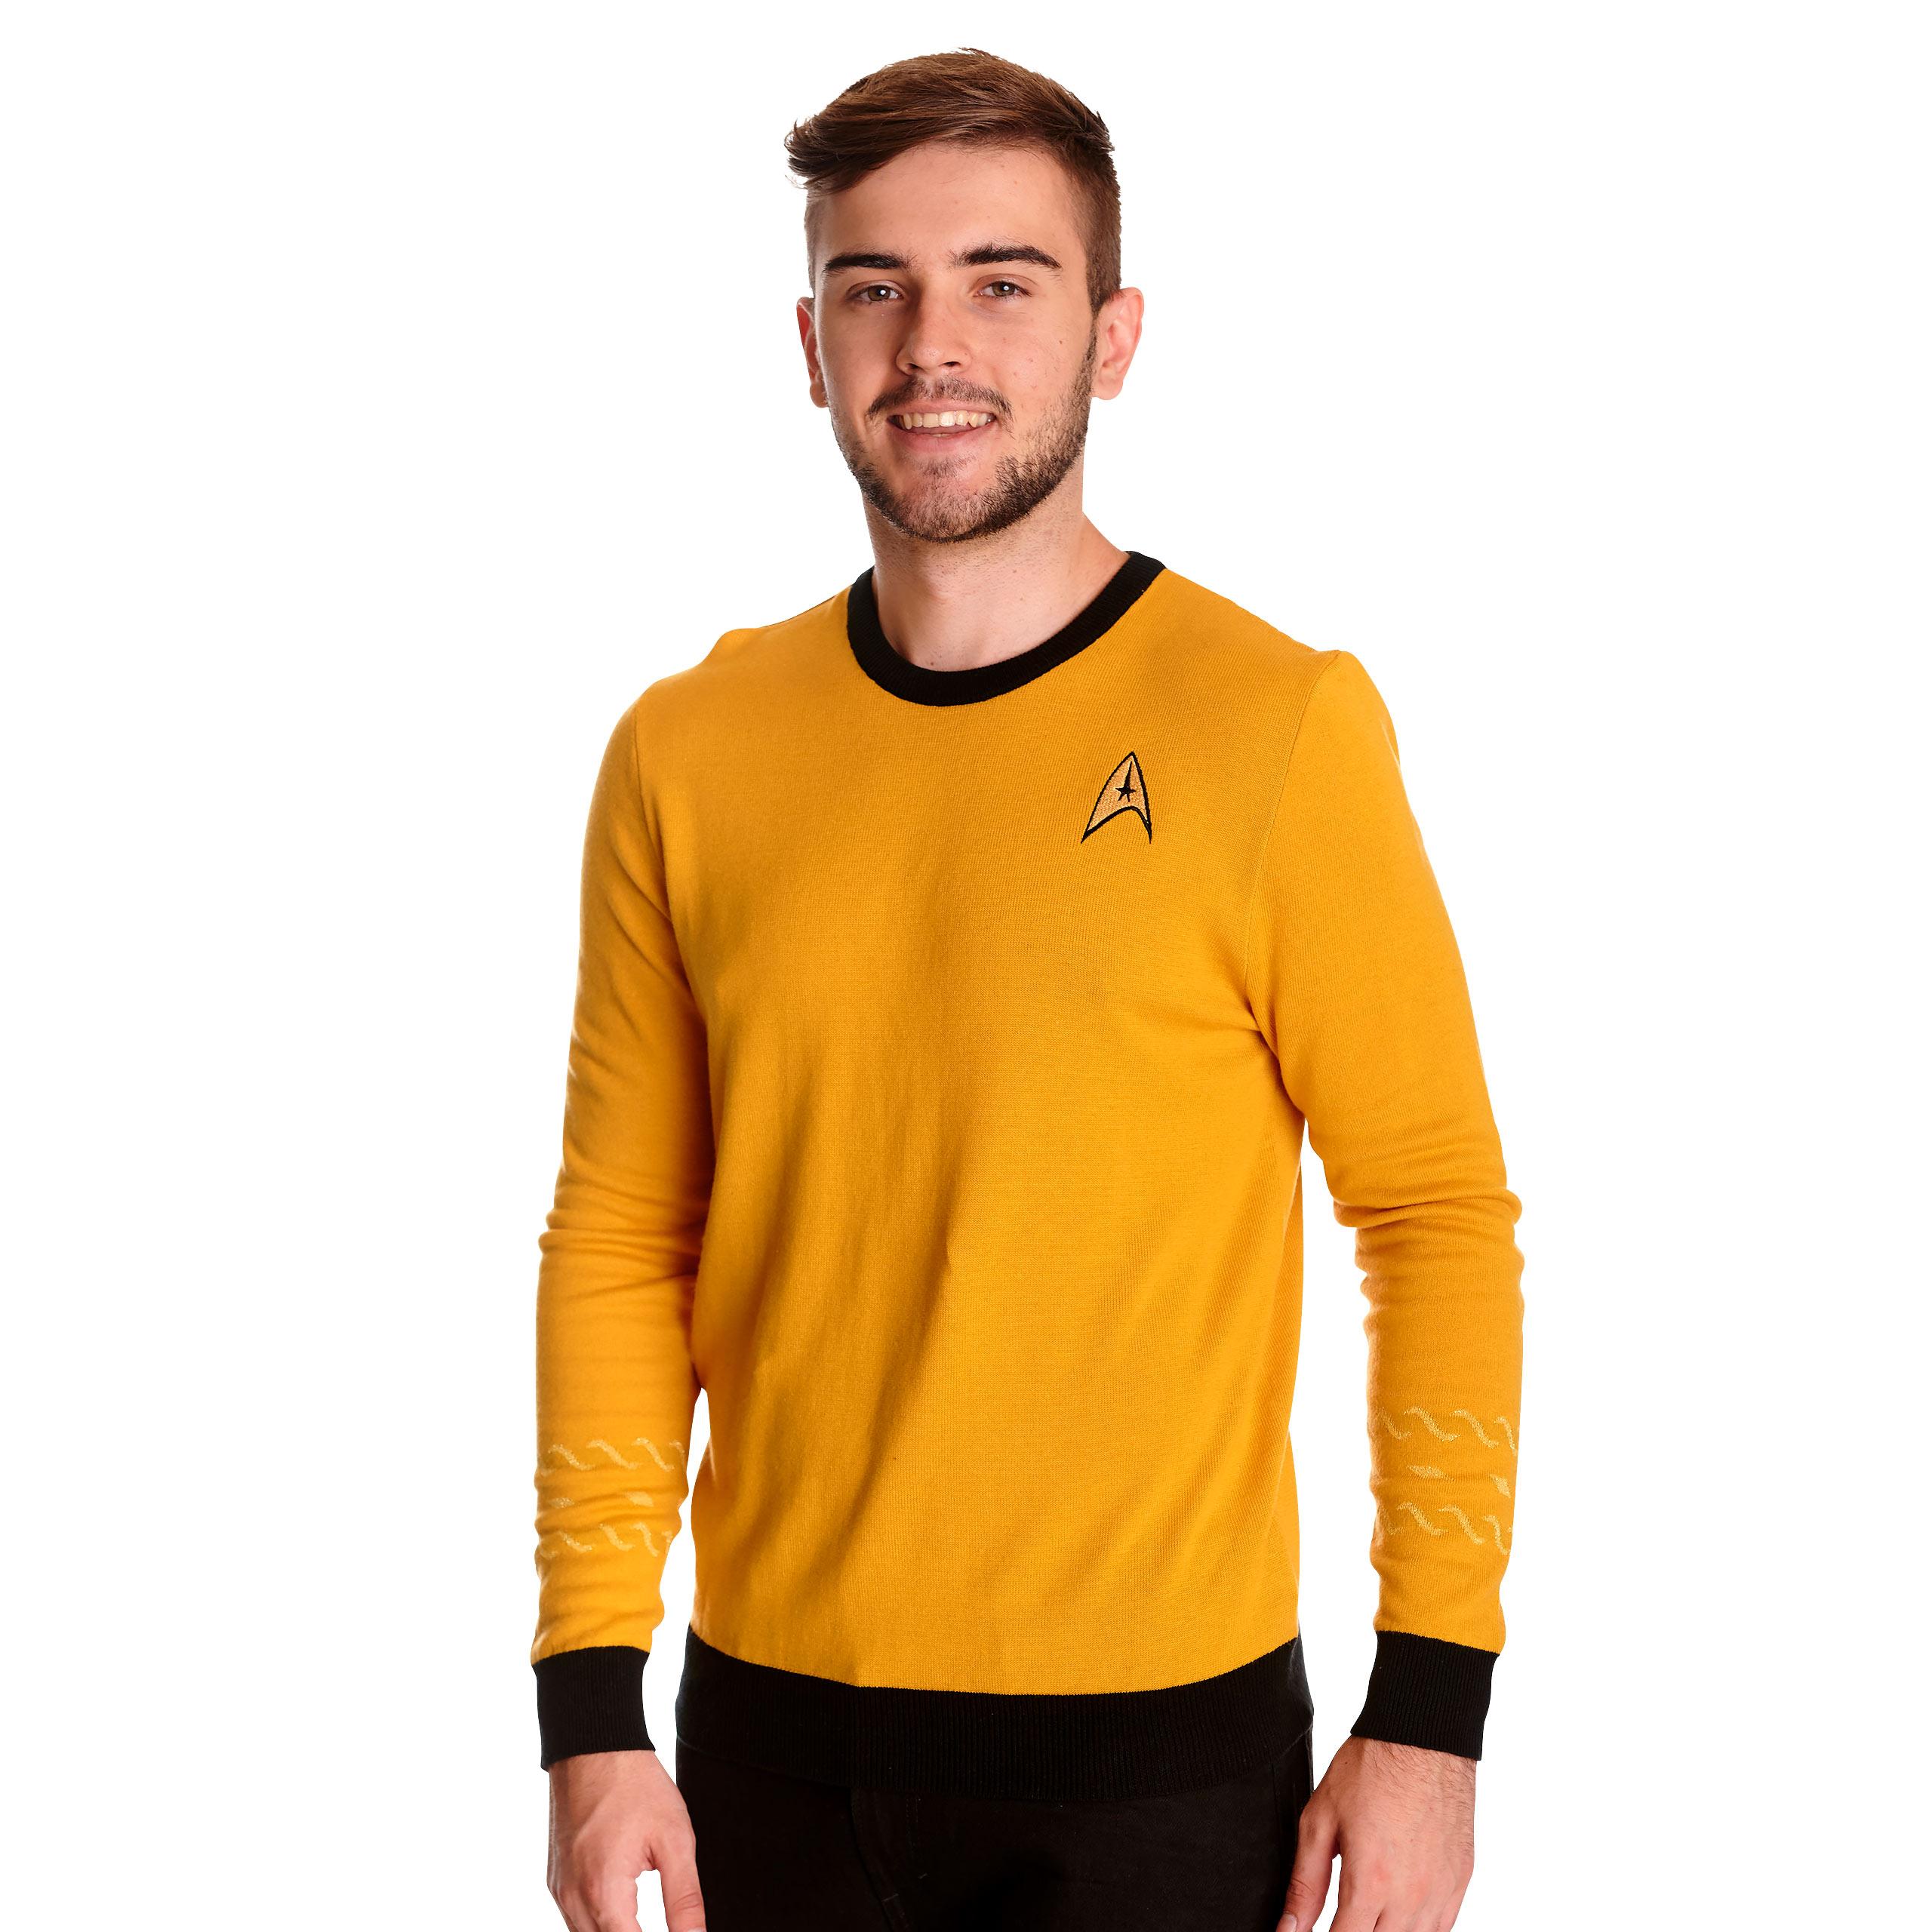 Star Trek - Kirk Uniform Strickpullover gelb